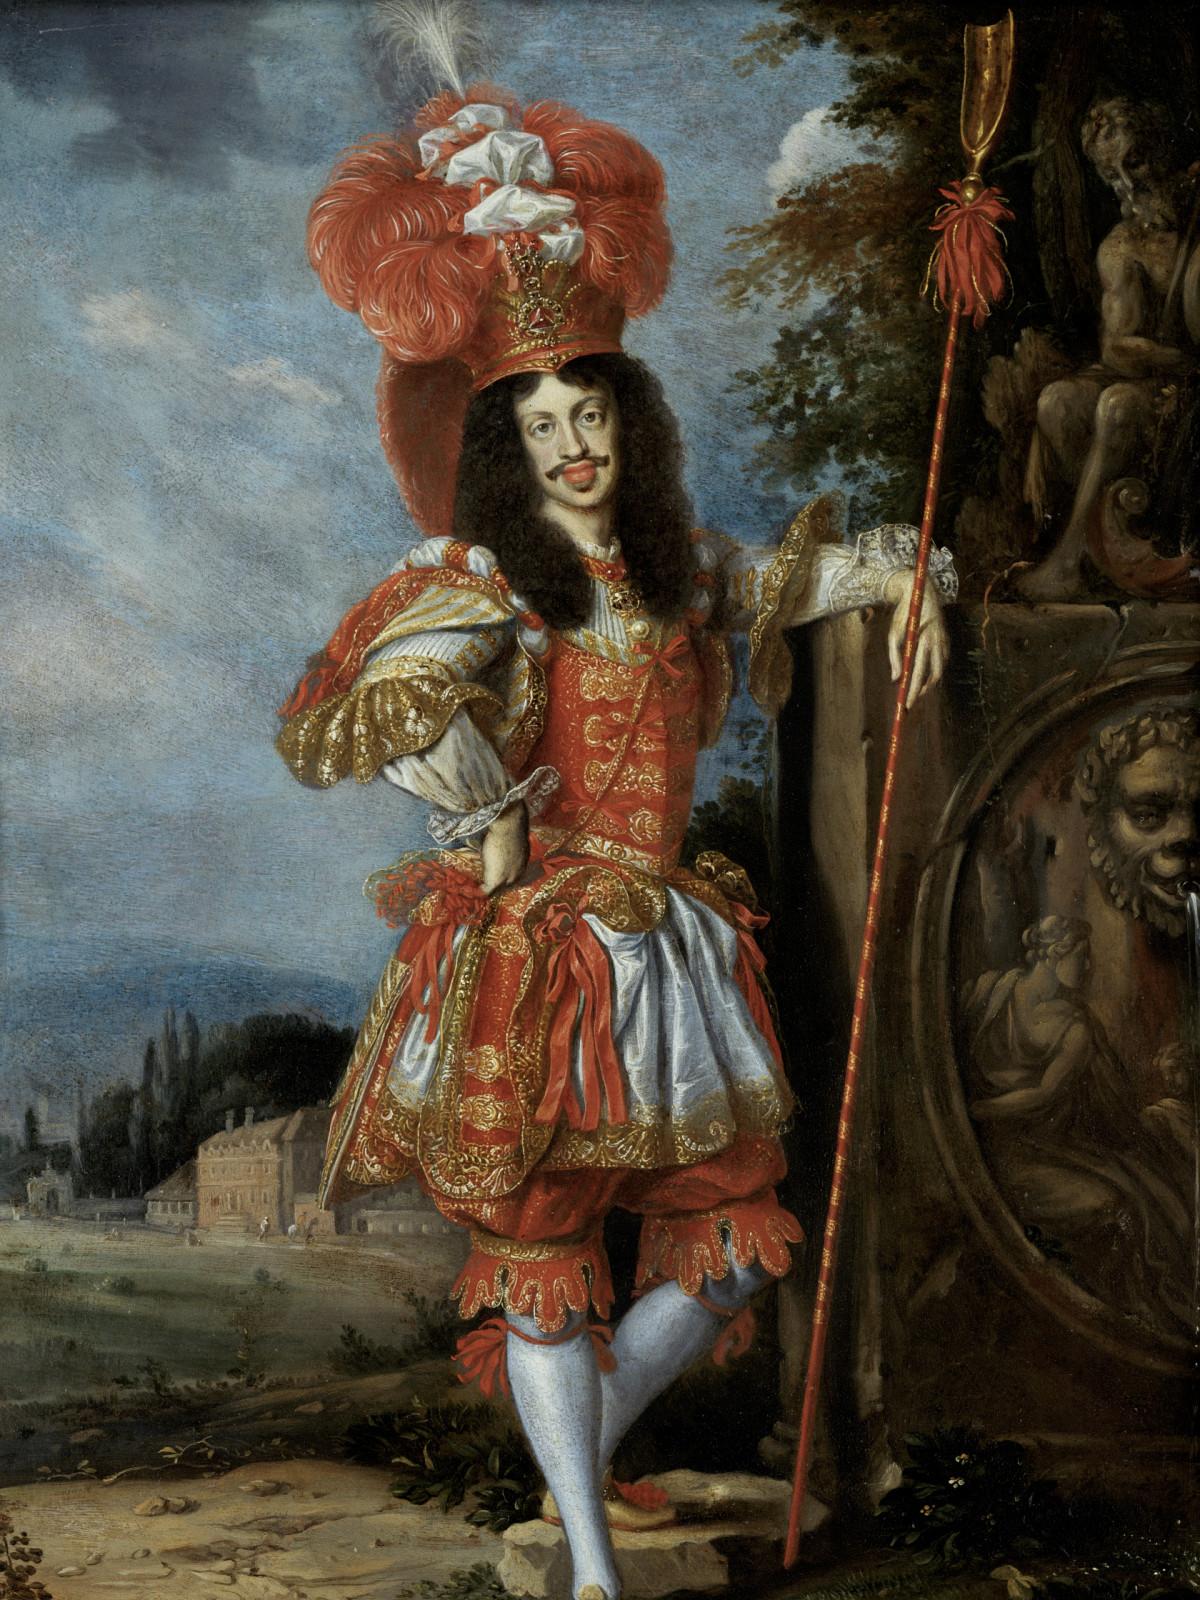 Habsburg Splendor, Emperor Leopold I